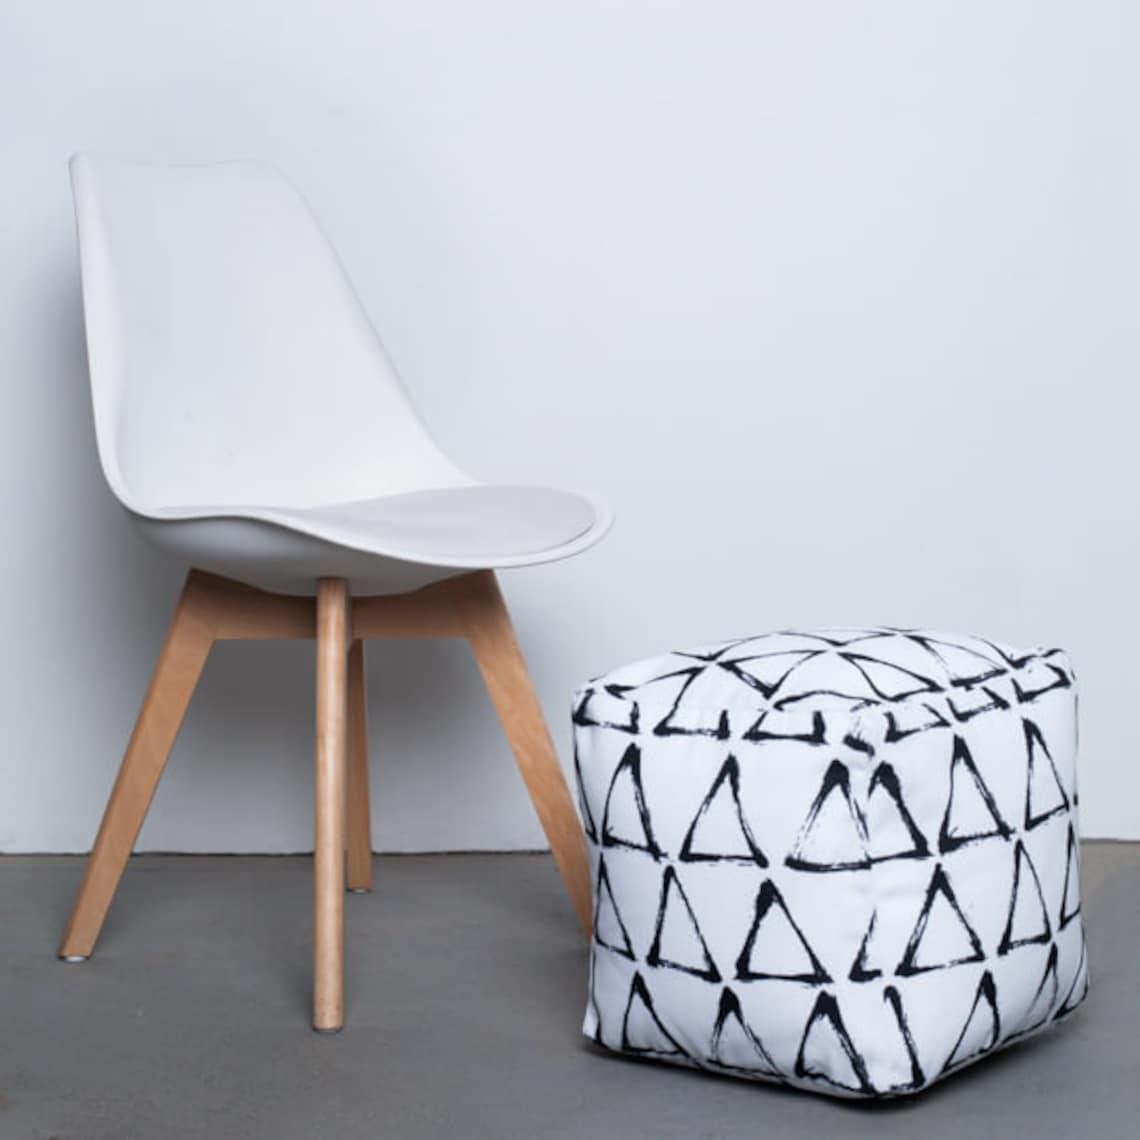 Black And White Print Boob Ottoman | Boob Print Furniture | Breasts Furniture | Boob Foot Rest | funny ottoman | feminist decor | breasts